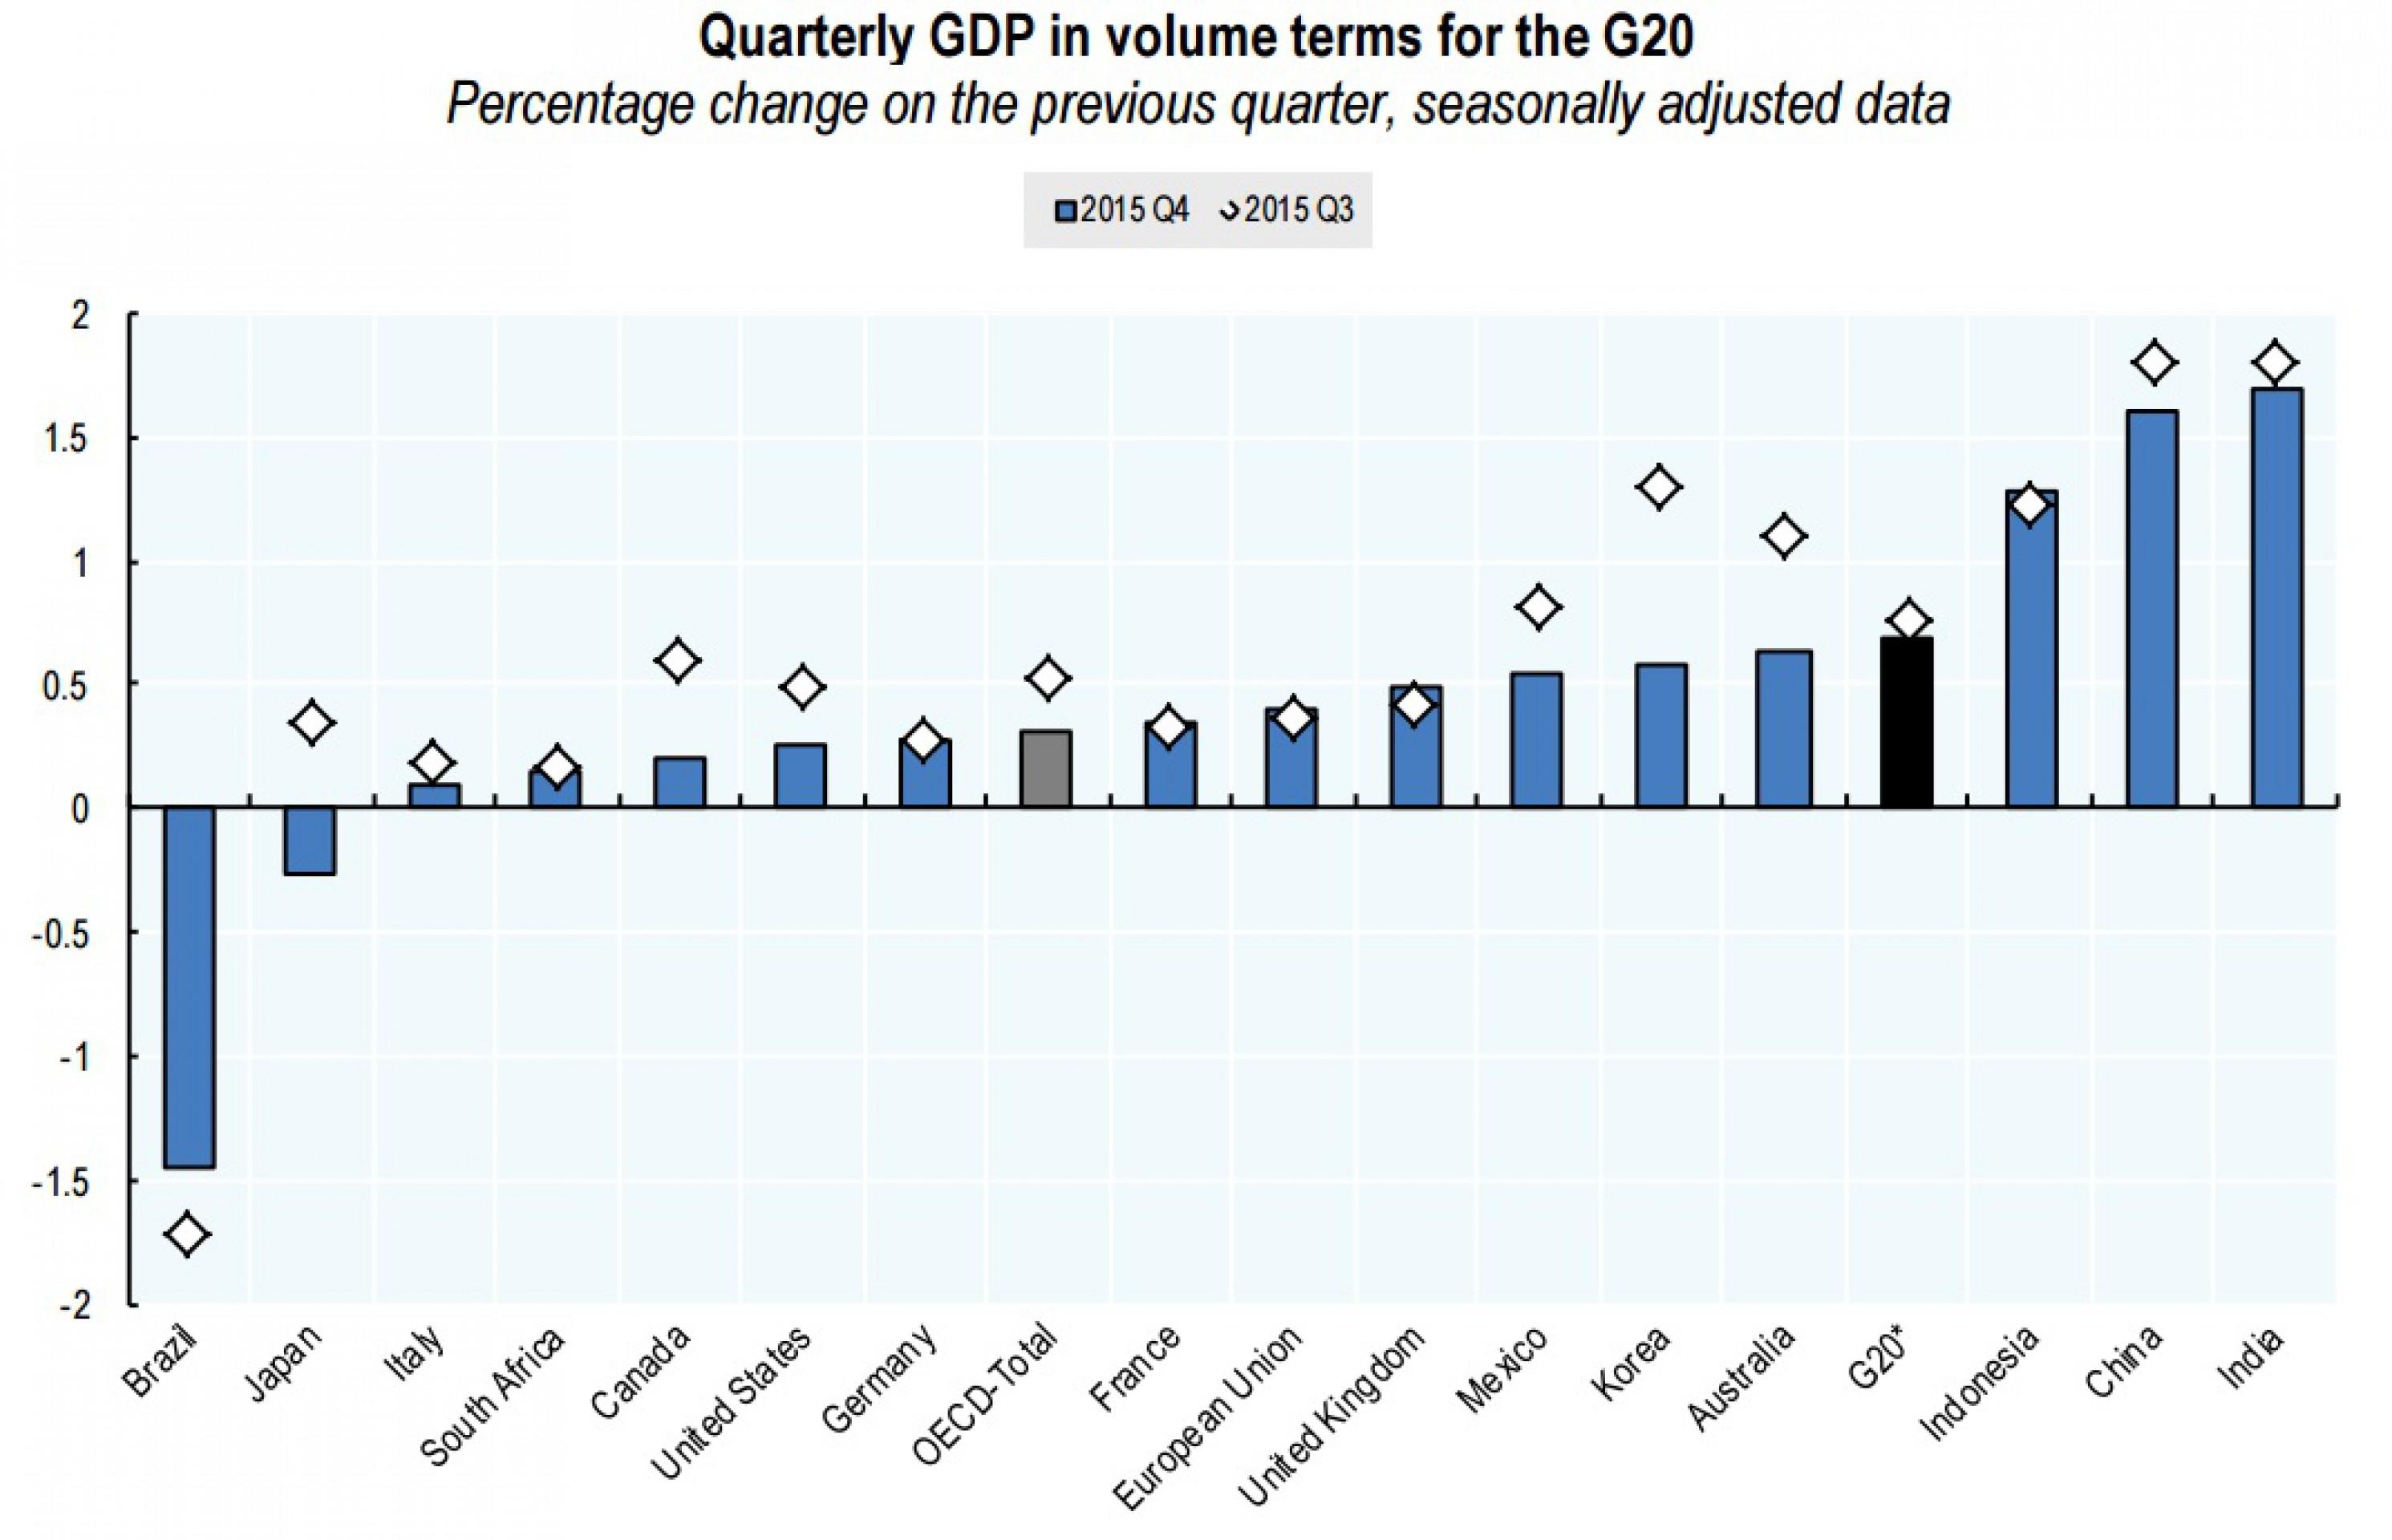 Рост ВВП стран G20 замедлился в IV квартале